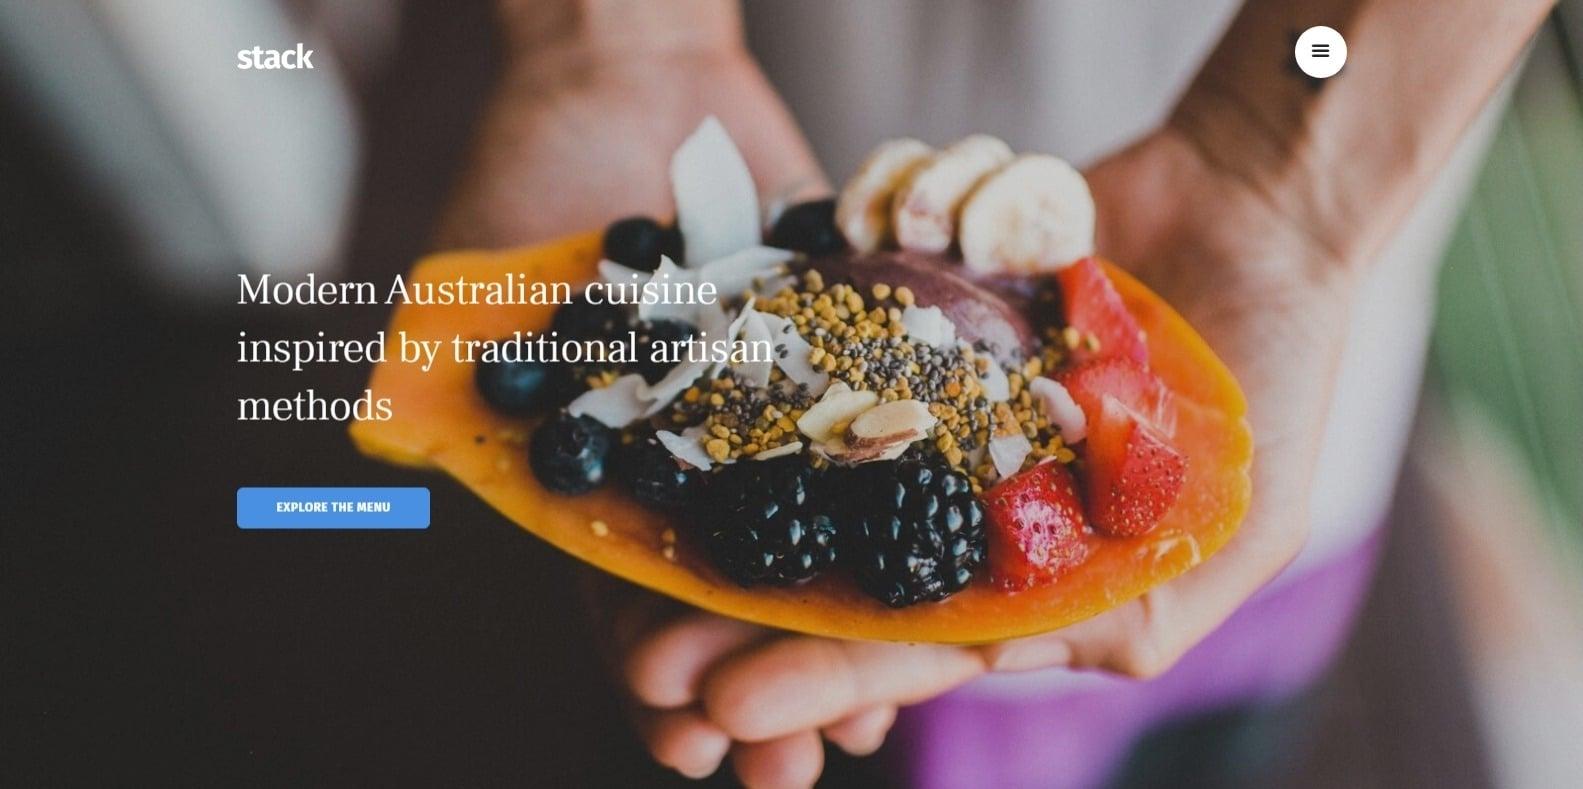 stack-restaurant-website-template